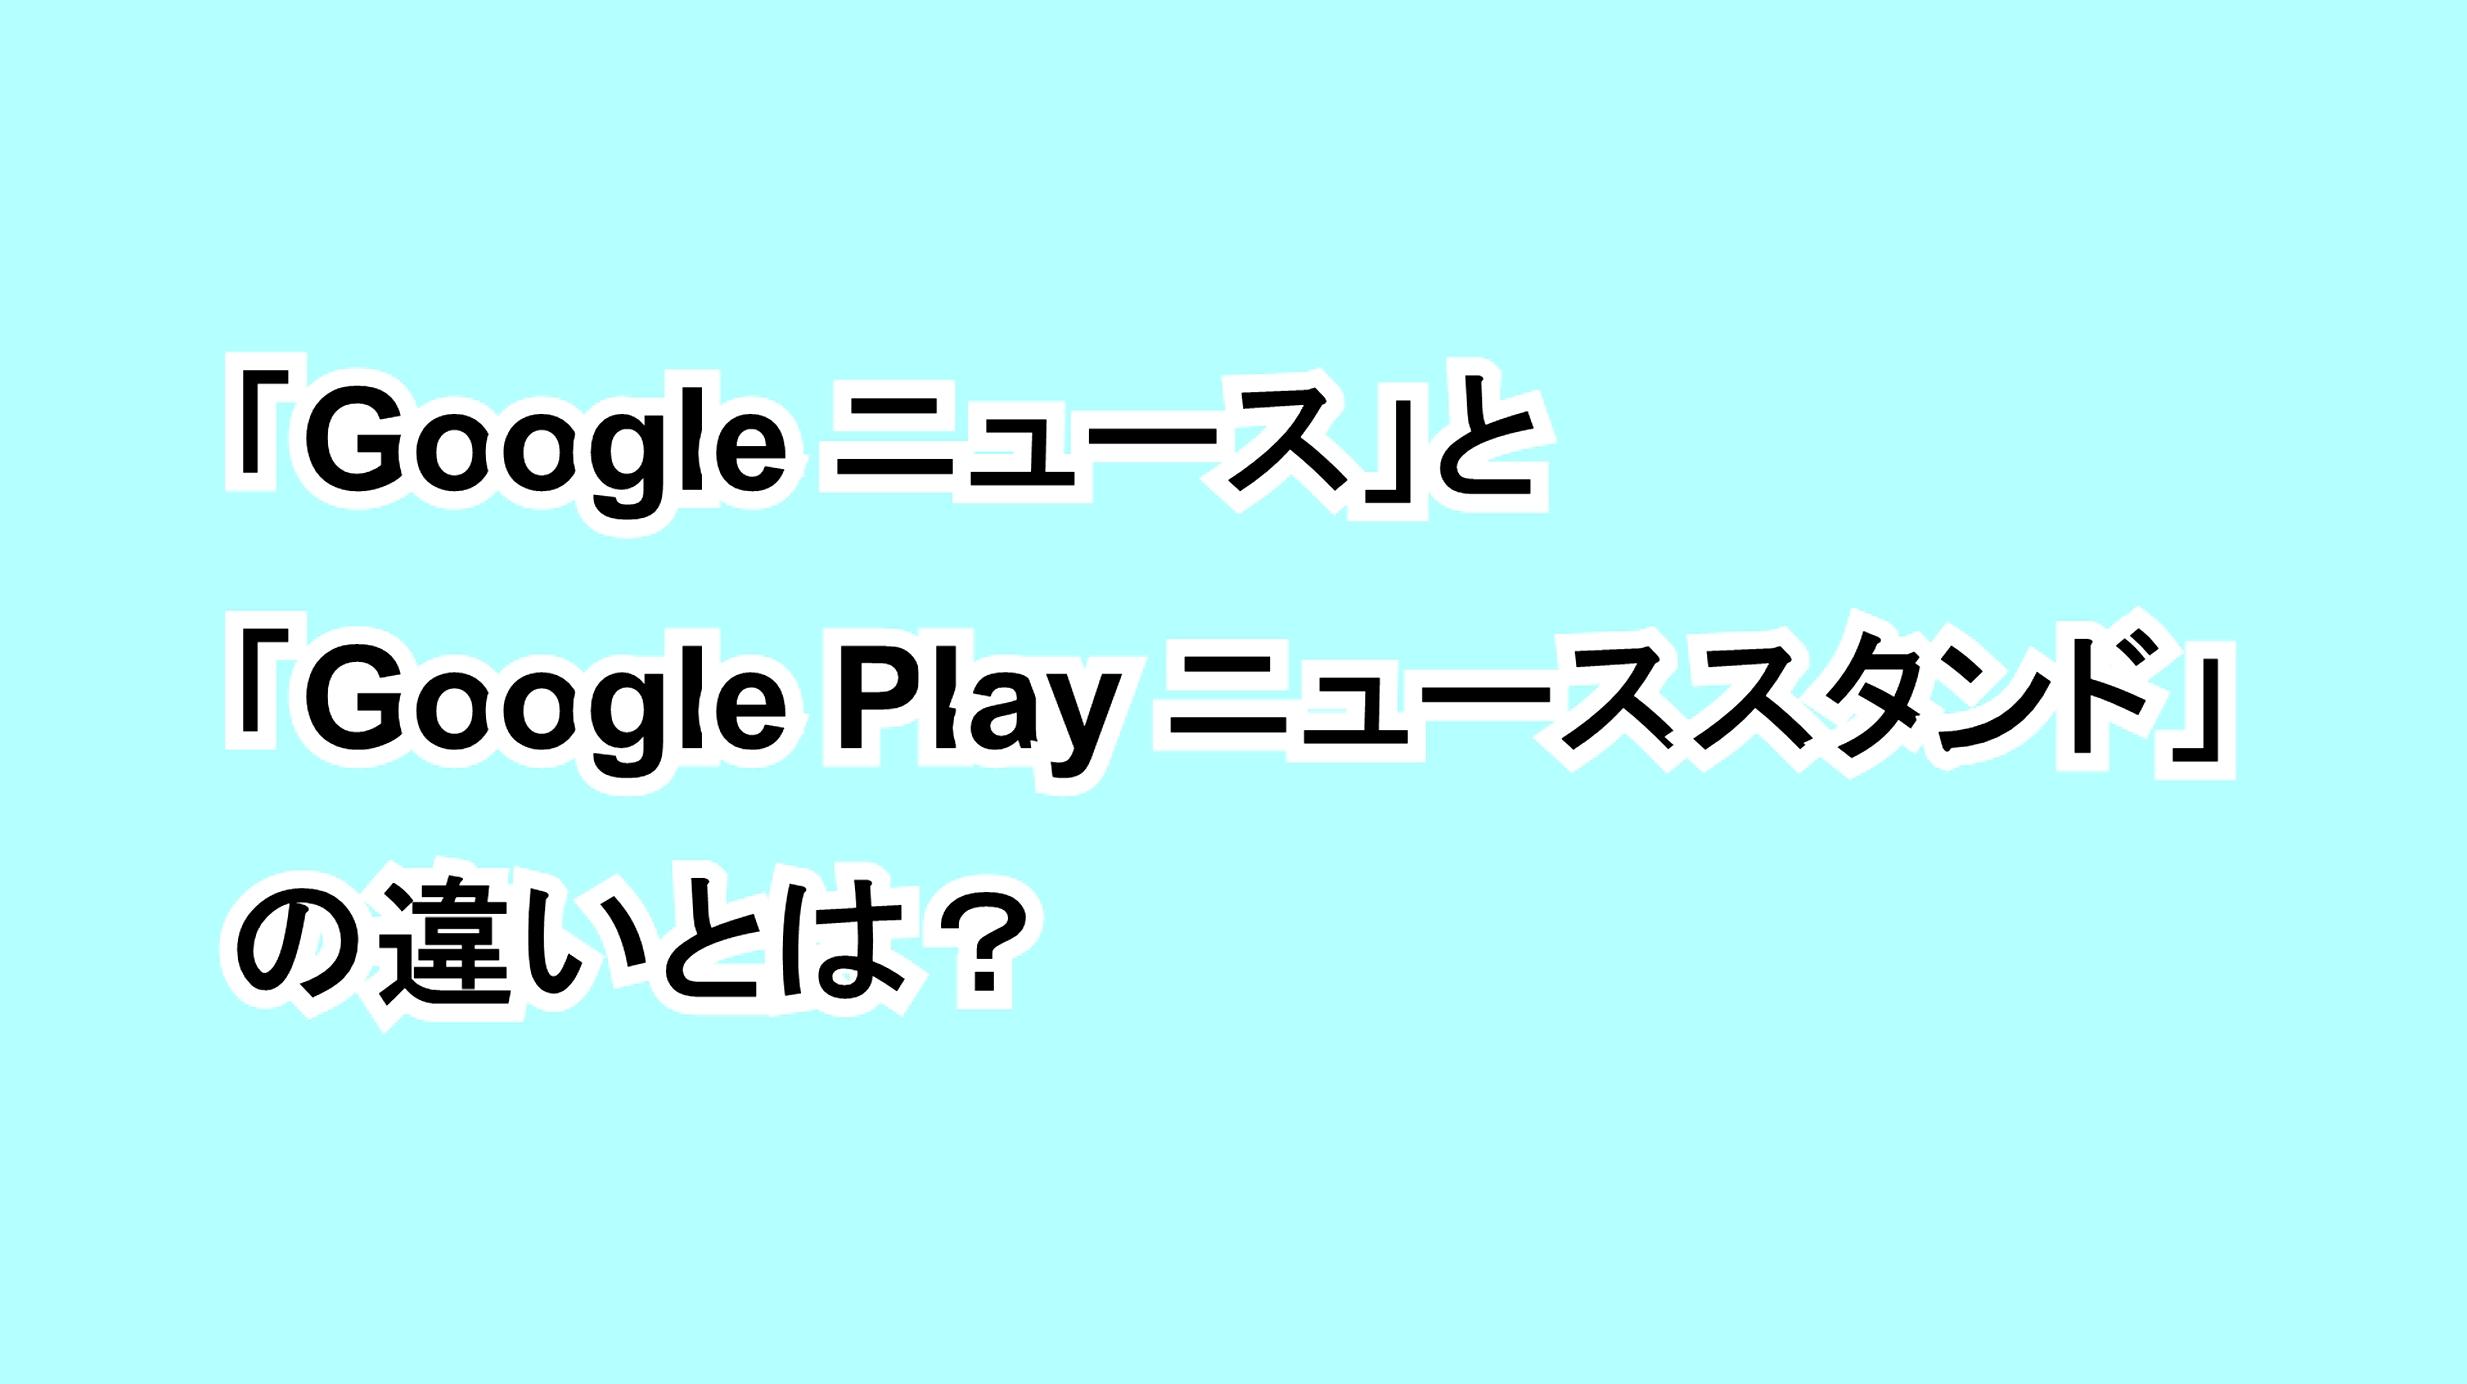 「Google ニュース」と「Google Play ニューススタンド」の違いとは?